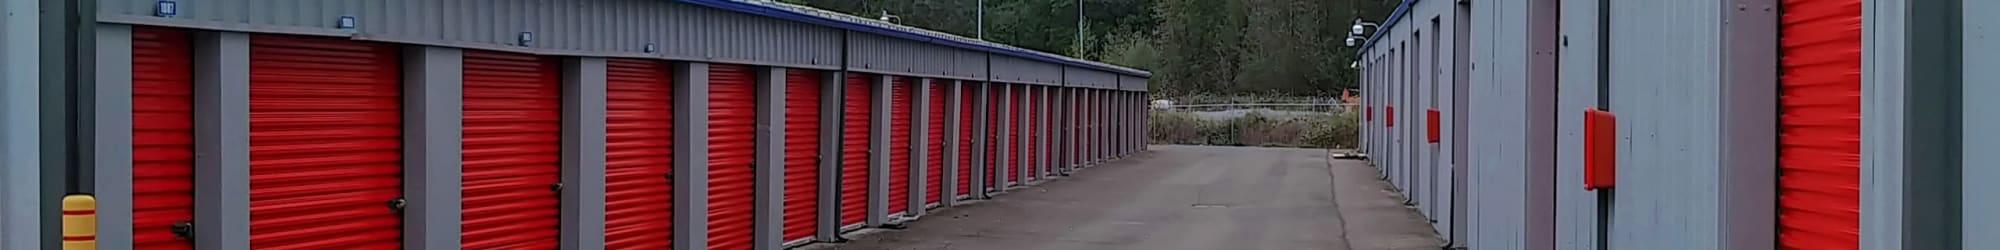 Self storage features at Trojan Storage in Bothell, Washington